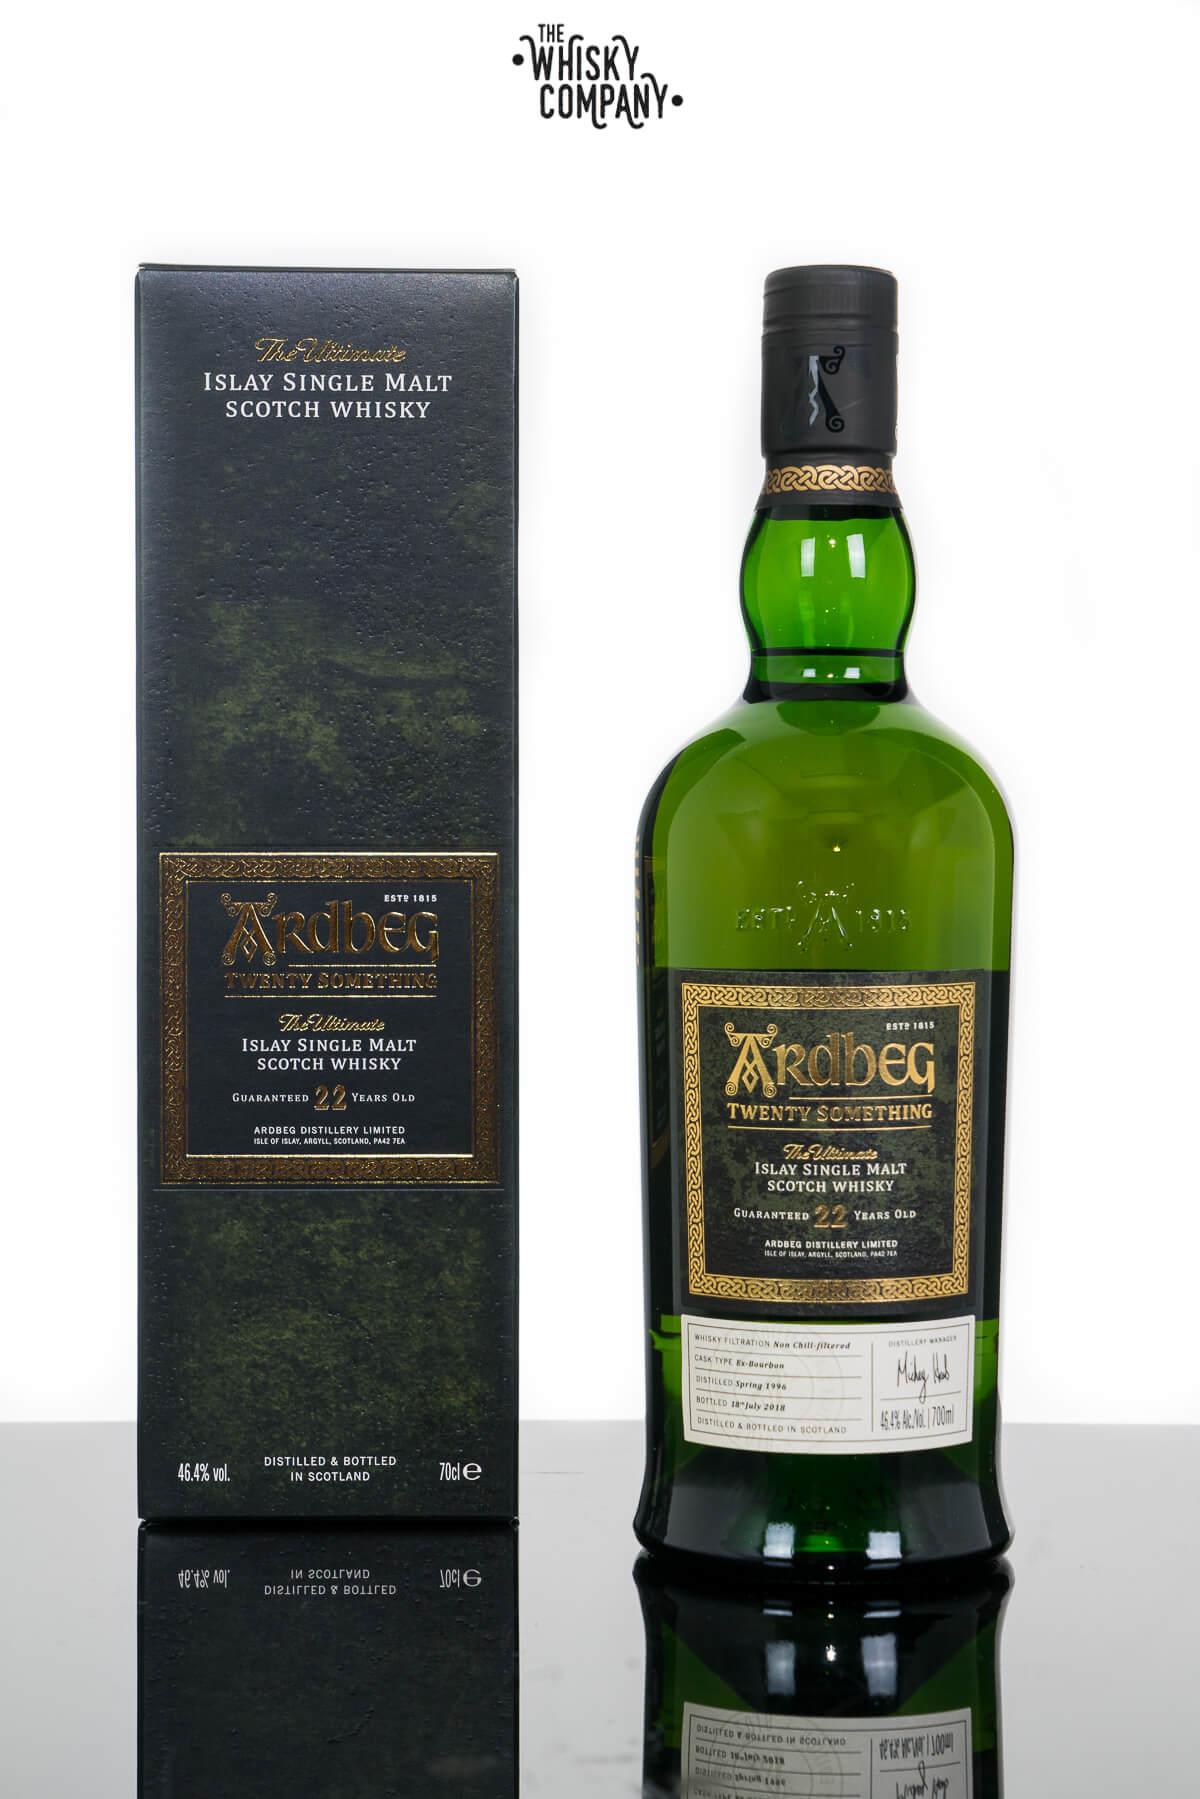 Ardbeg Twenty Something 22 Years Old Islay Single Malt Scotch Whisky (700ml)